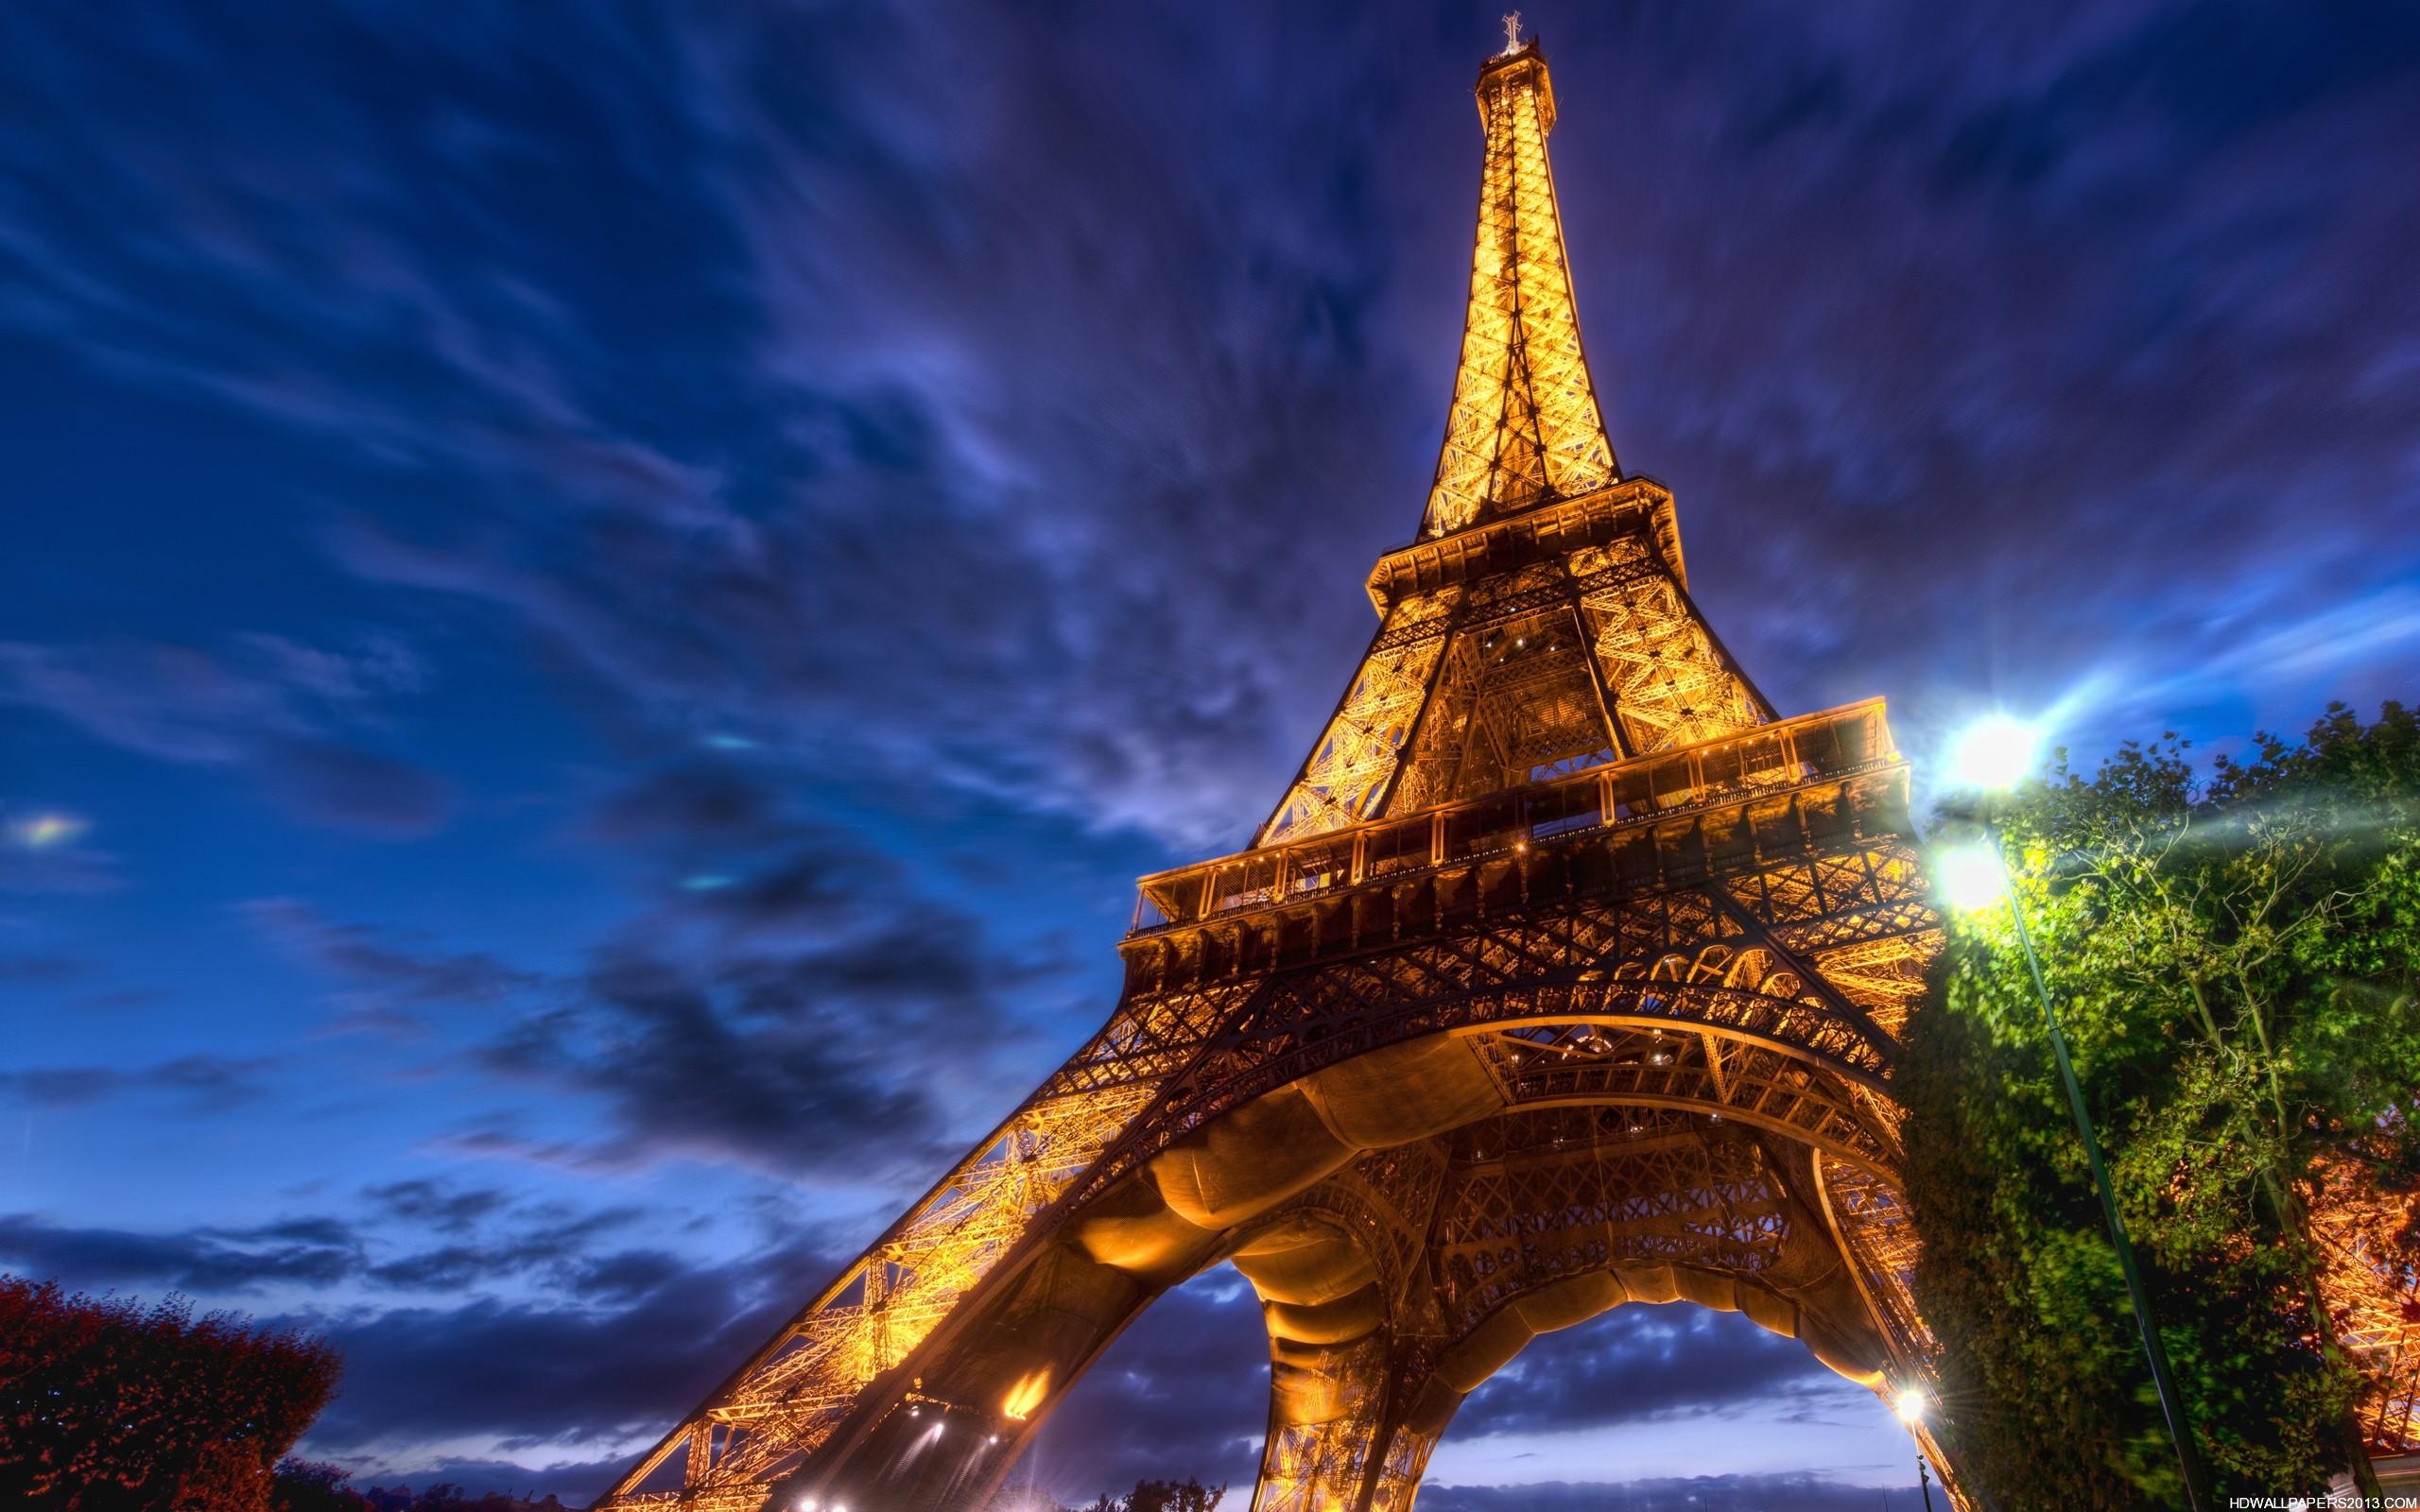 Masterly Eiffel Tower Wallpaper Hd Eiffel Tower Wallpaper Eiffel Tower Wallpaper Definition Definition Eiffel Tower Wallpaper Black houzz-03 Eiffel Tower Wallpaper